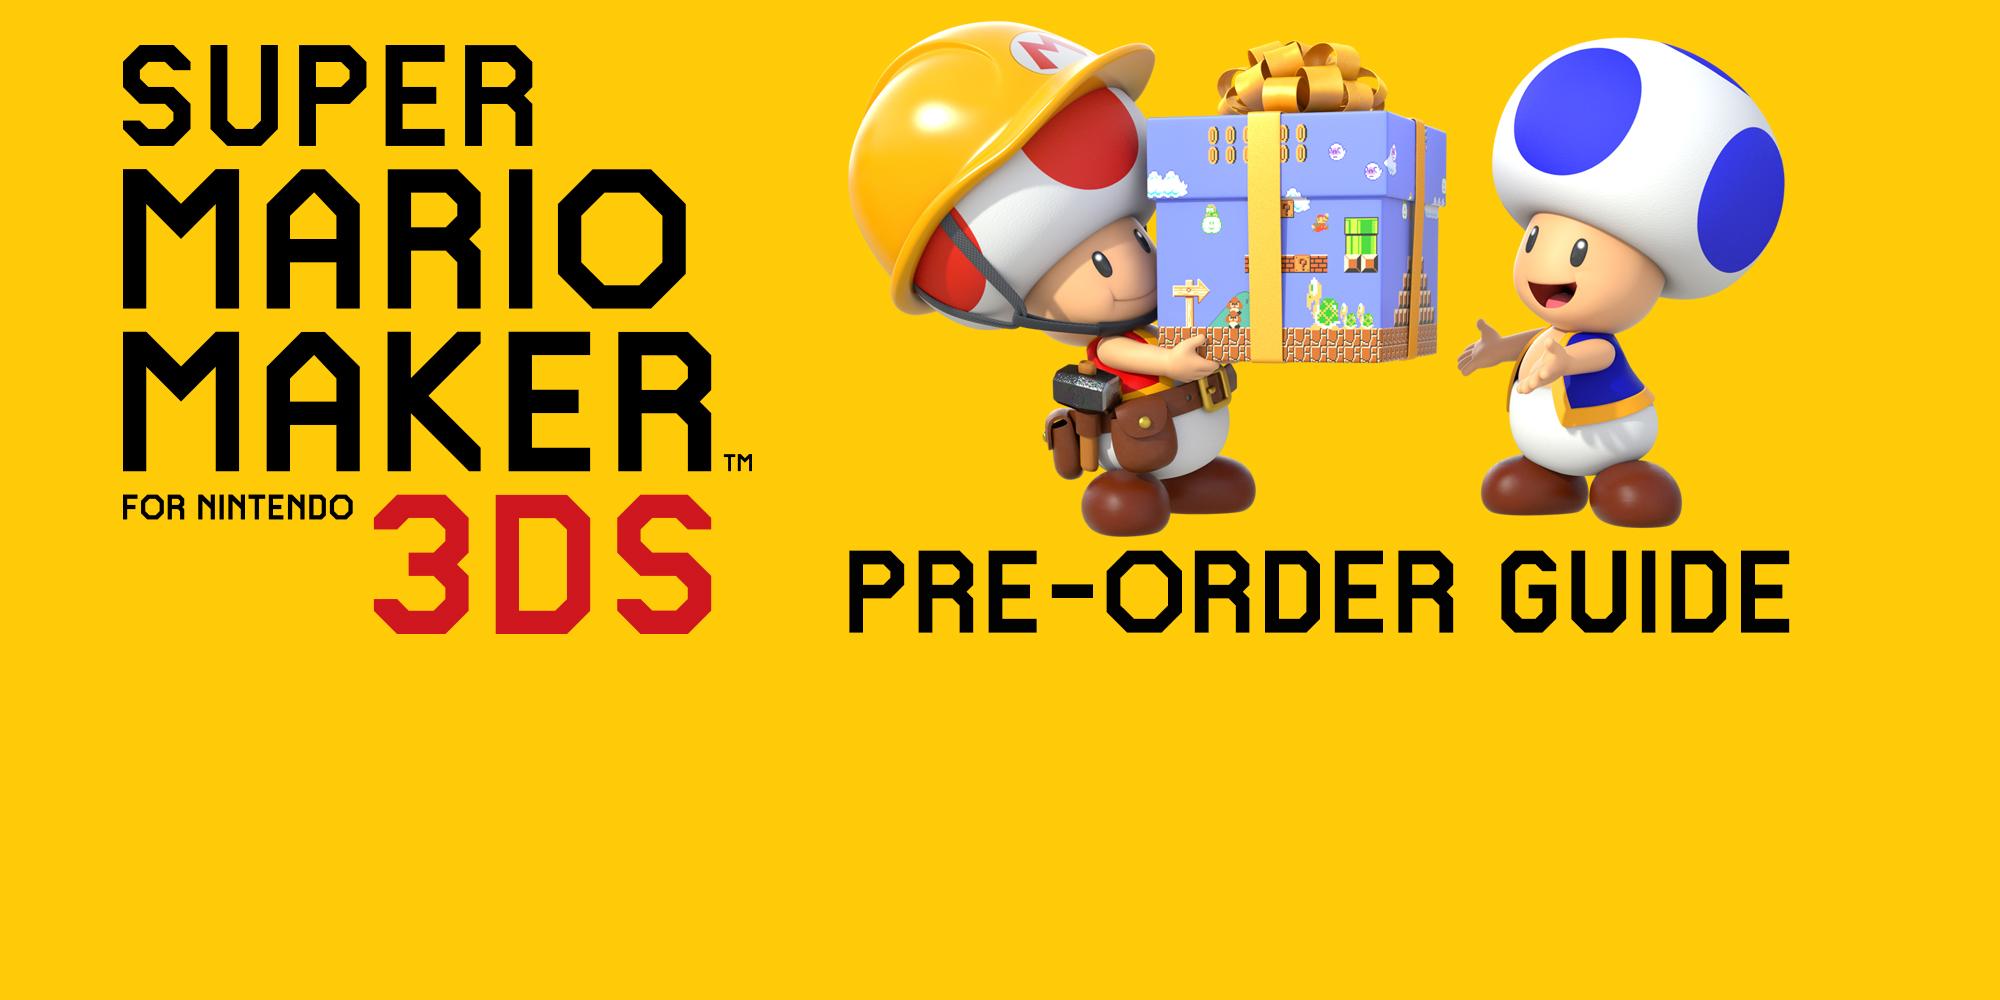 Super Mario Maker For Nintendo 3DS Pre Order Item Guide